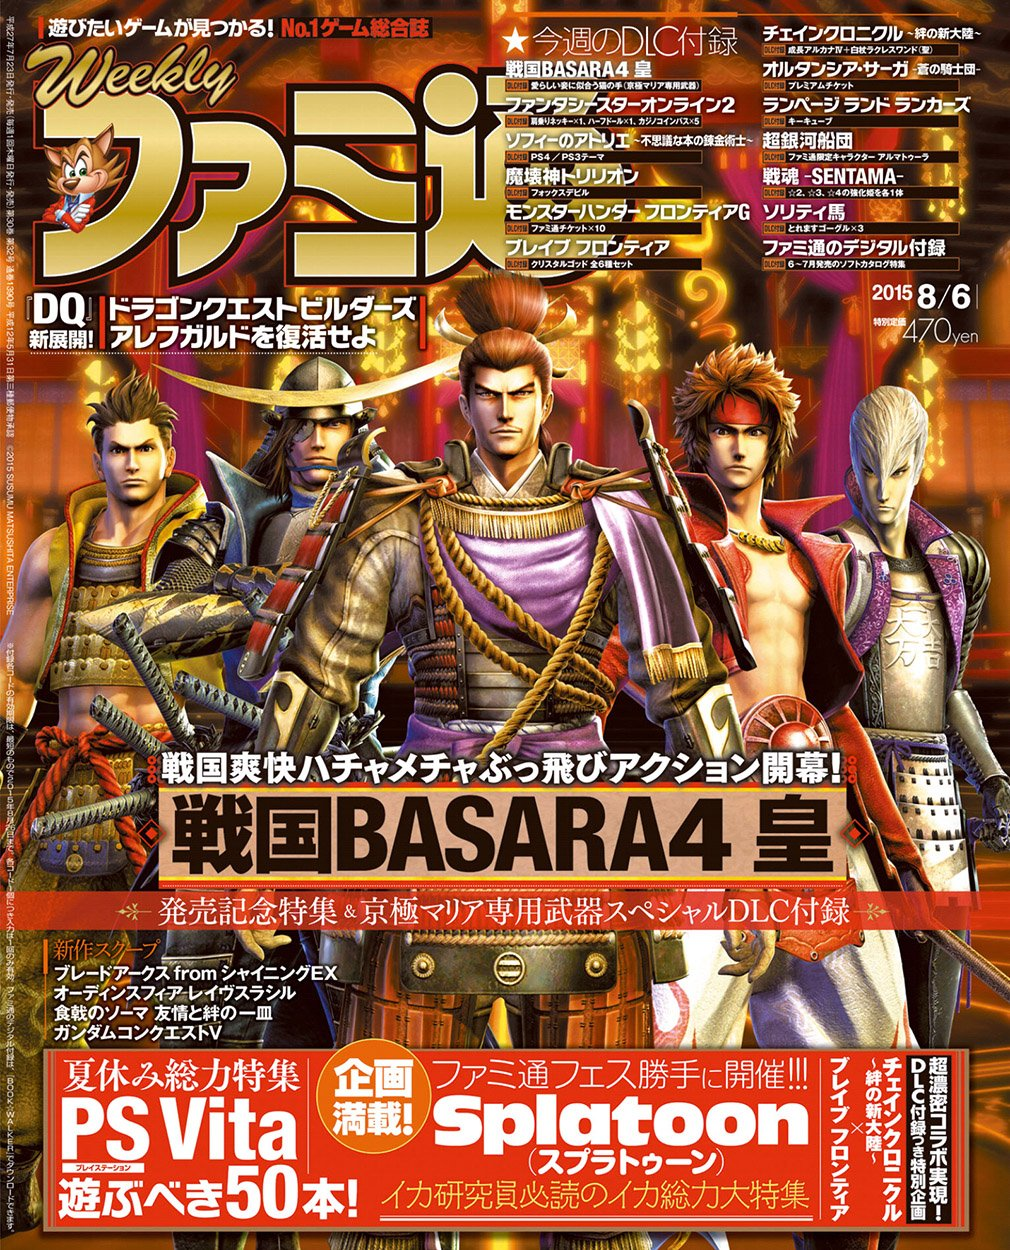 Famitsu 1390 August 6, 2015